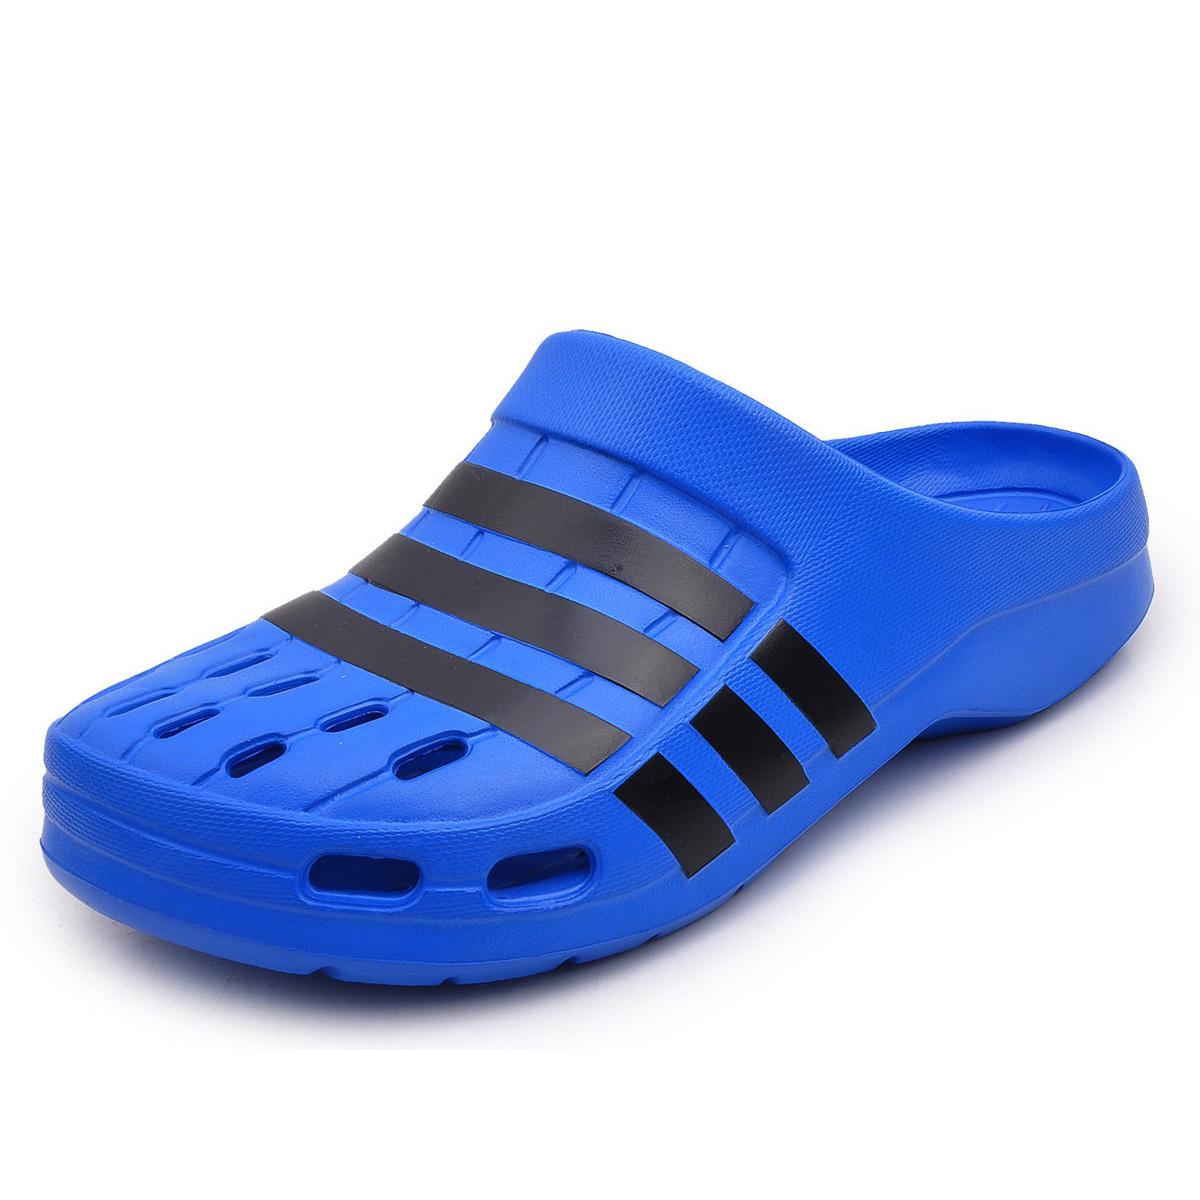 Proporcional encuentro Anillo duro  sandalia adidas azul